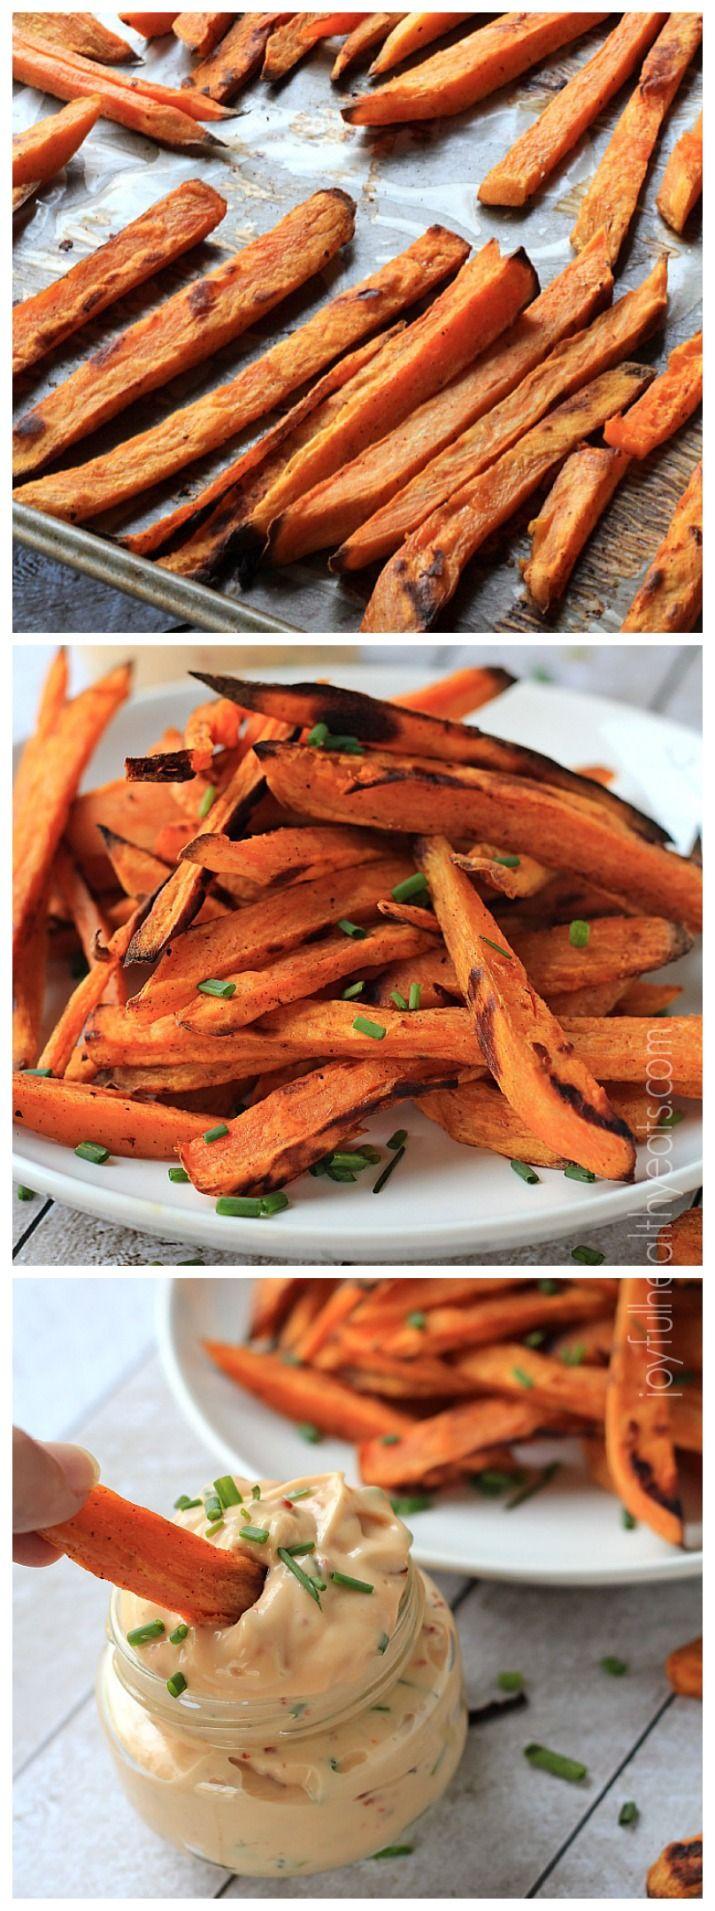 The ultimate side dish ... Crispy Baked Sweet Potato Fries with Chipotle Aioli | www.joyfulhealthyeats.com